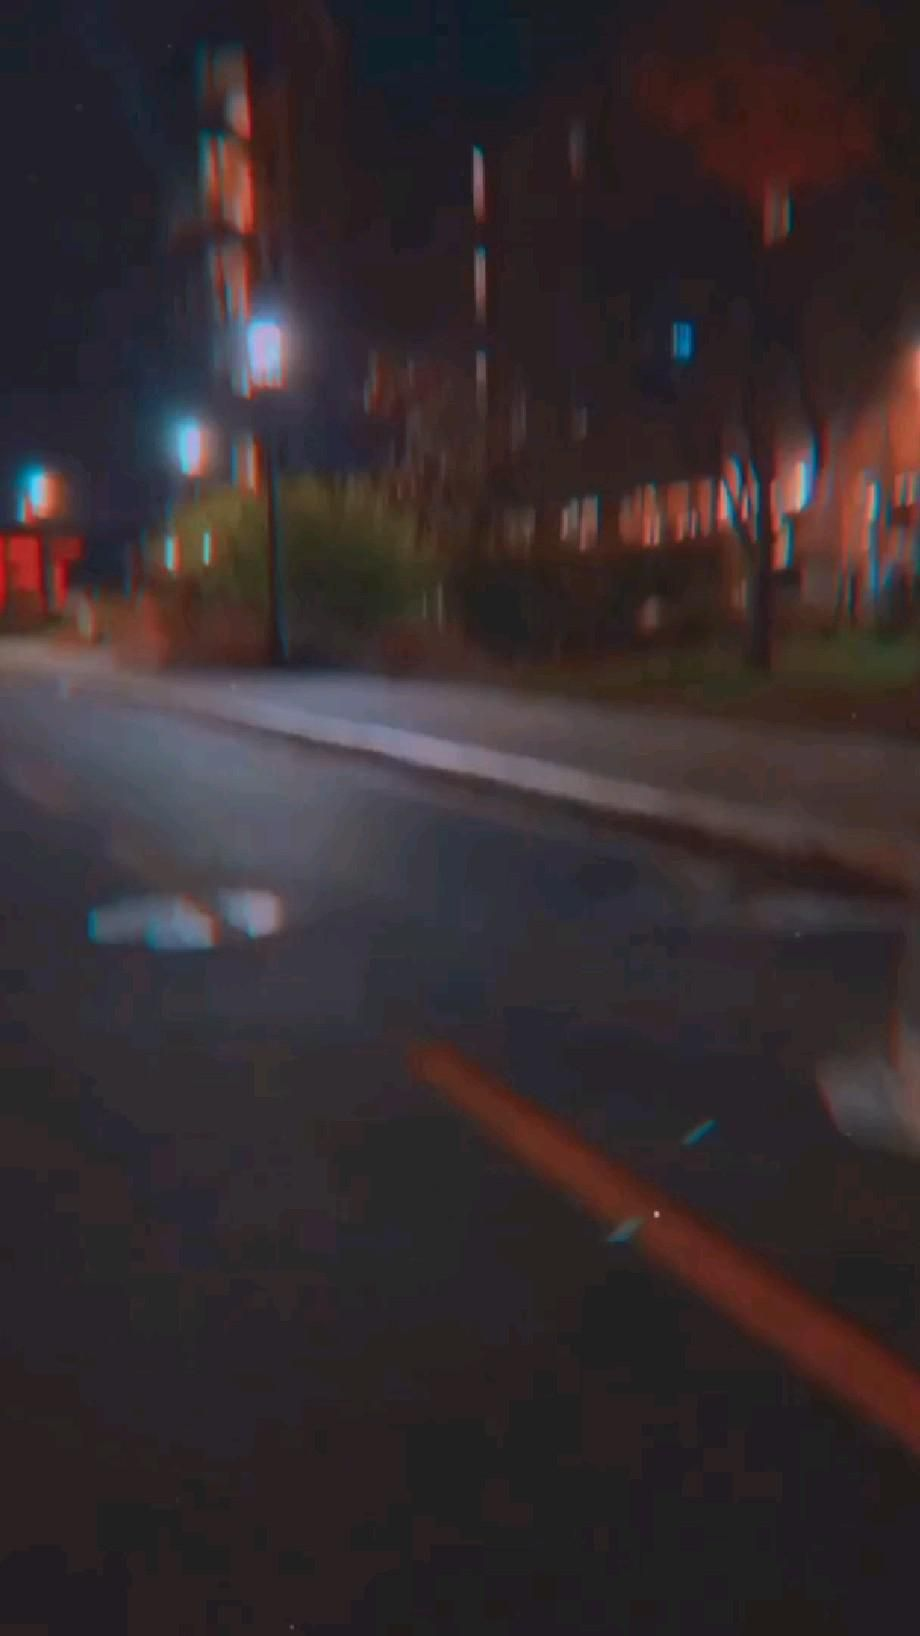 song lyrics music video city lights Aesthetic song tik tok bts song